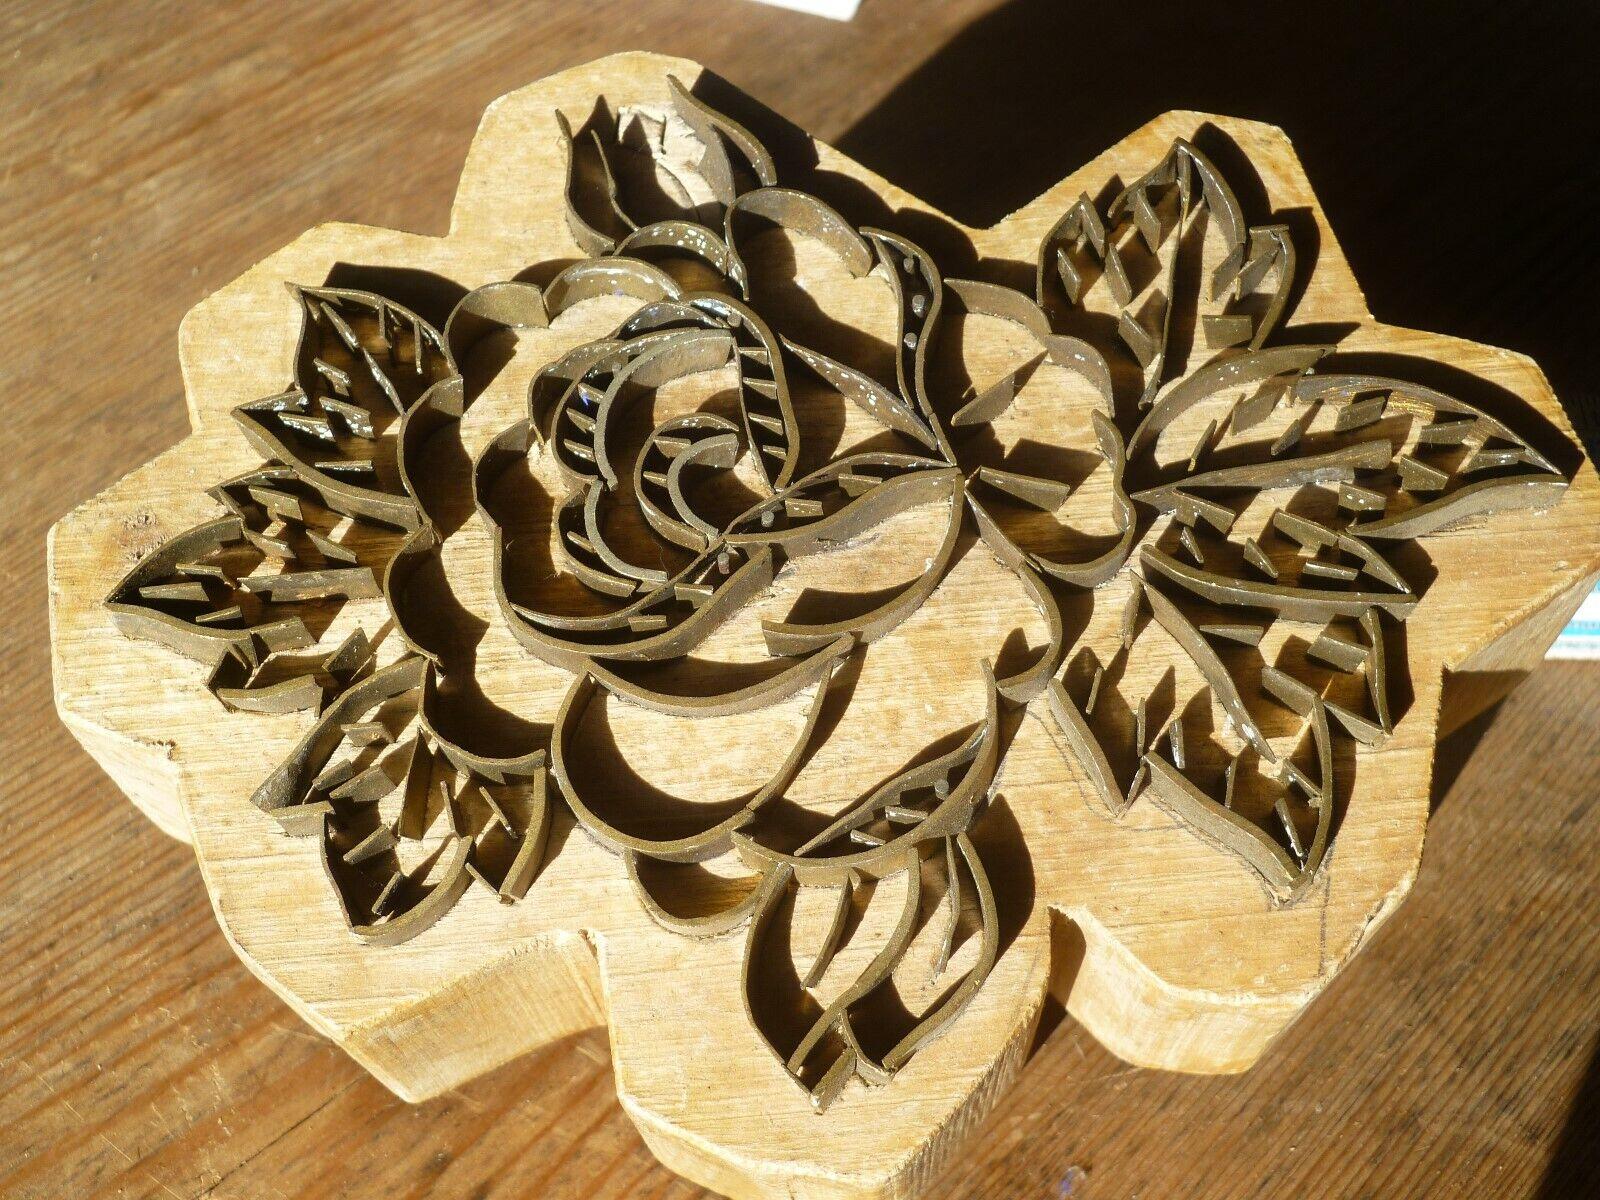 Druckstock Stempel Antik ca 1900 Motiv Blume Messing Holz sehr schön